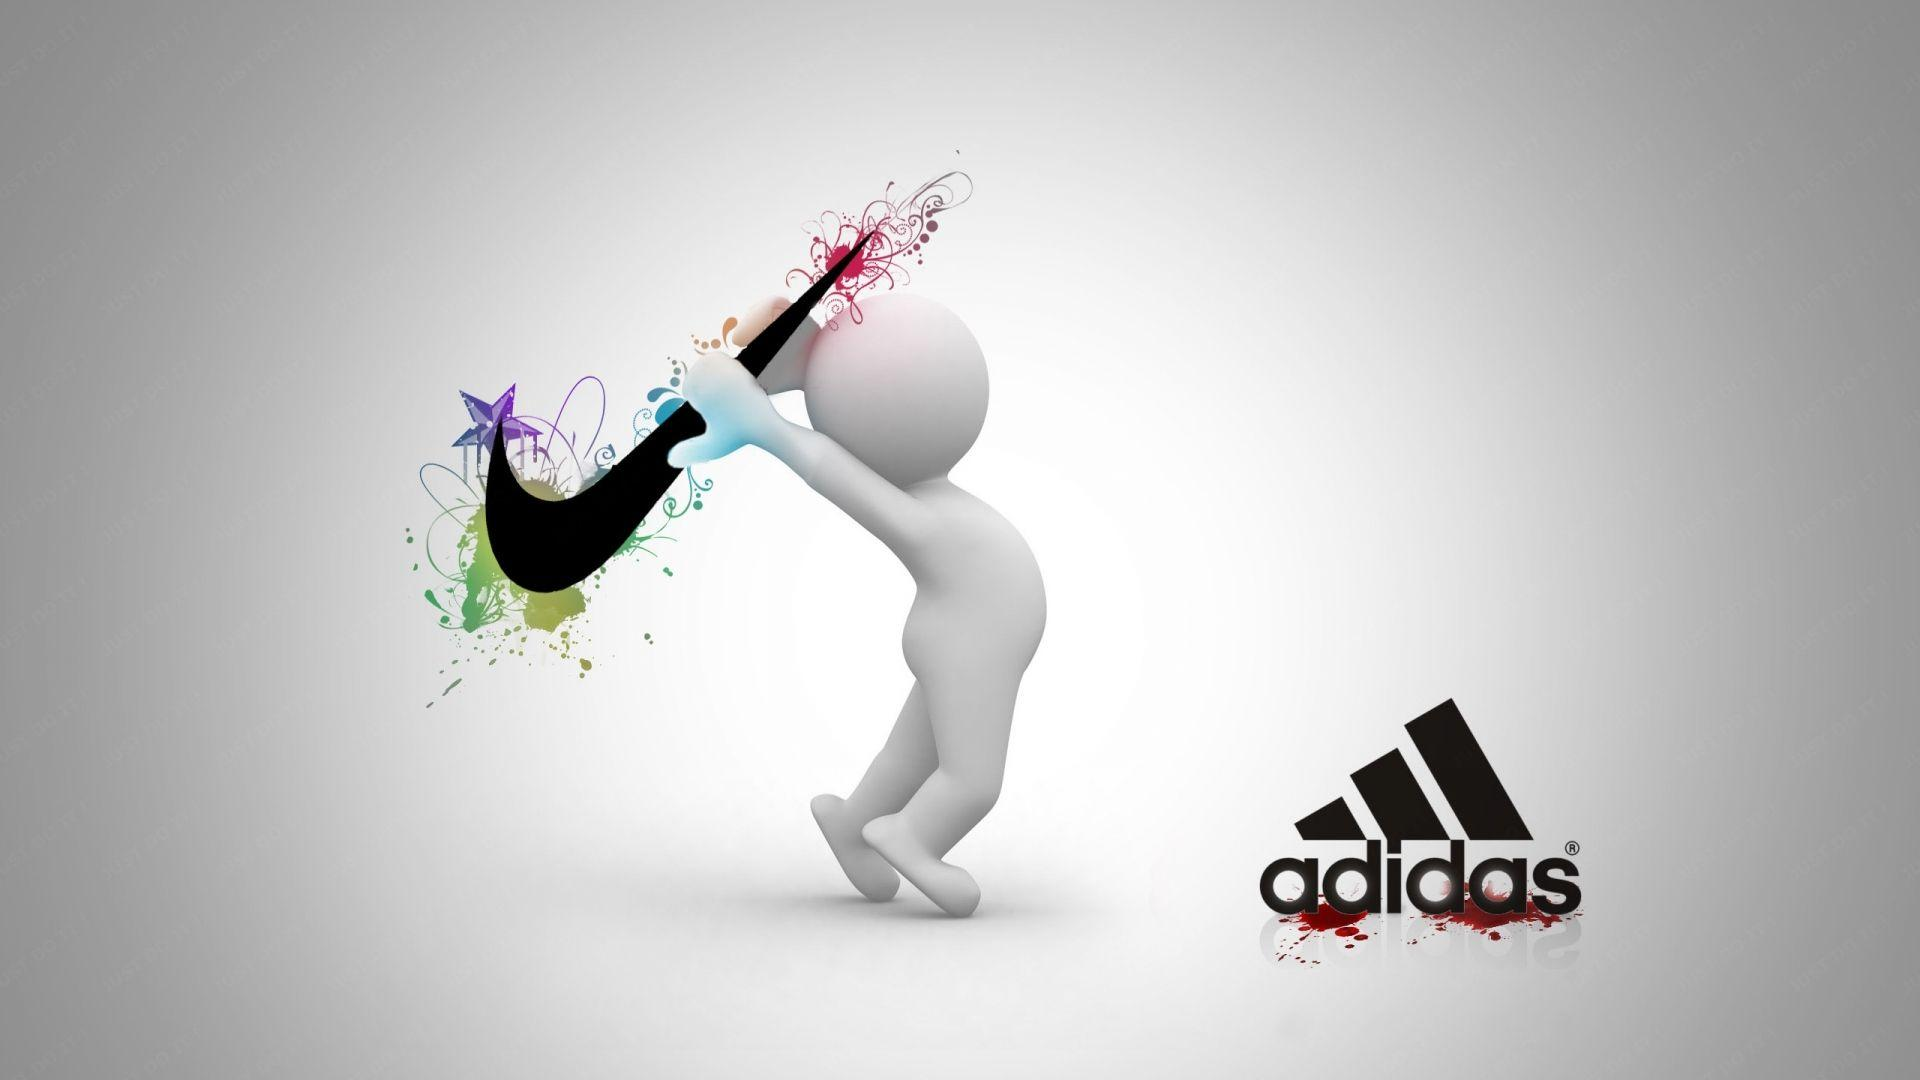 Nike Wallpapers HD 1920x1080